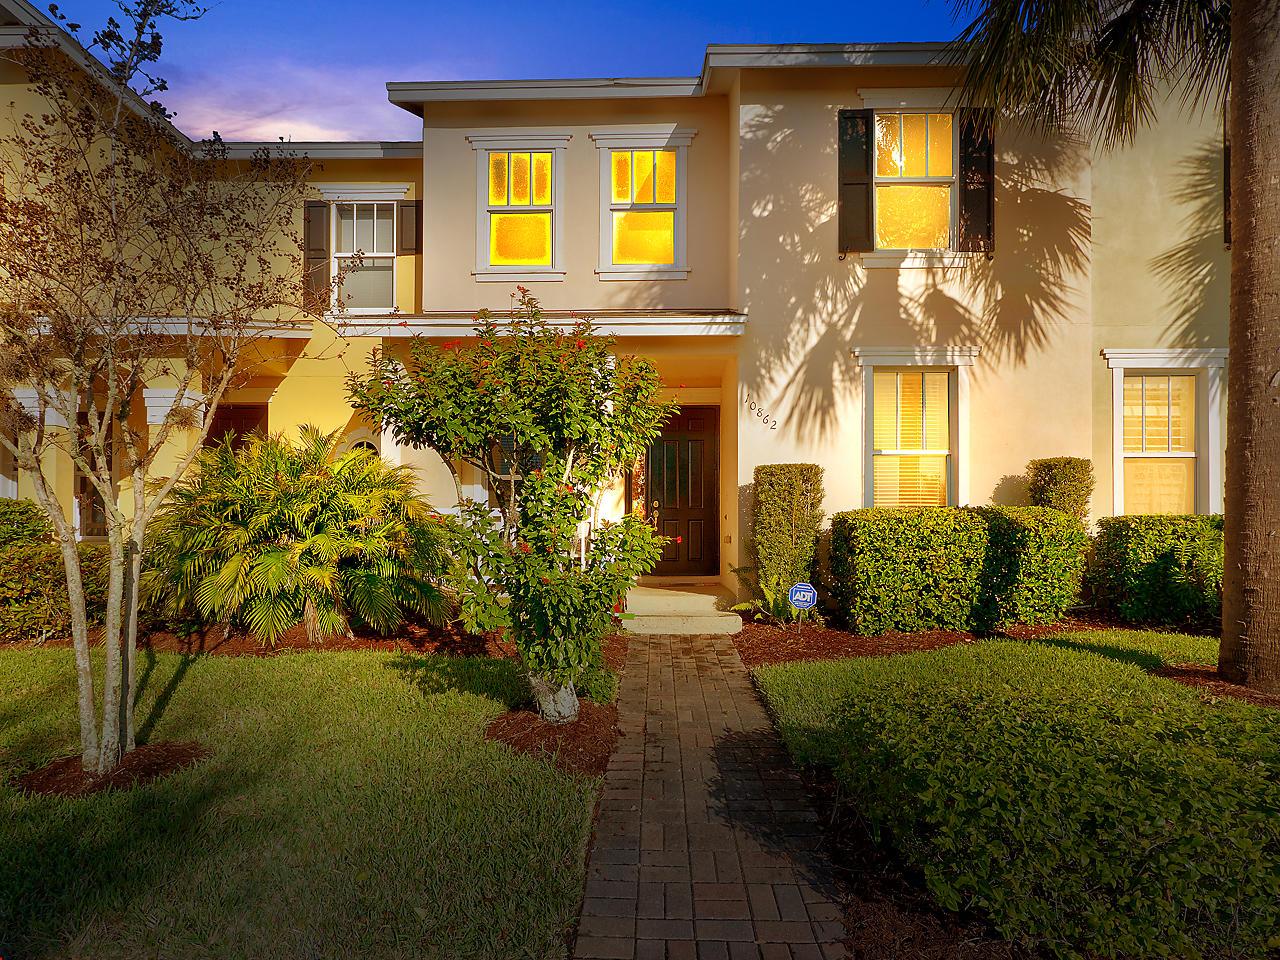 10862 Sw Meeting Street, Port Saint Lucie, FL 34987